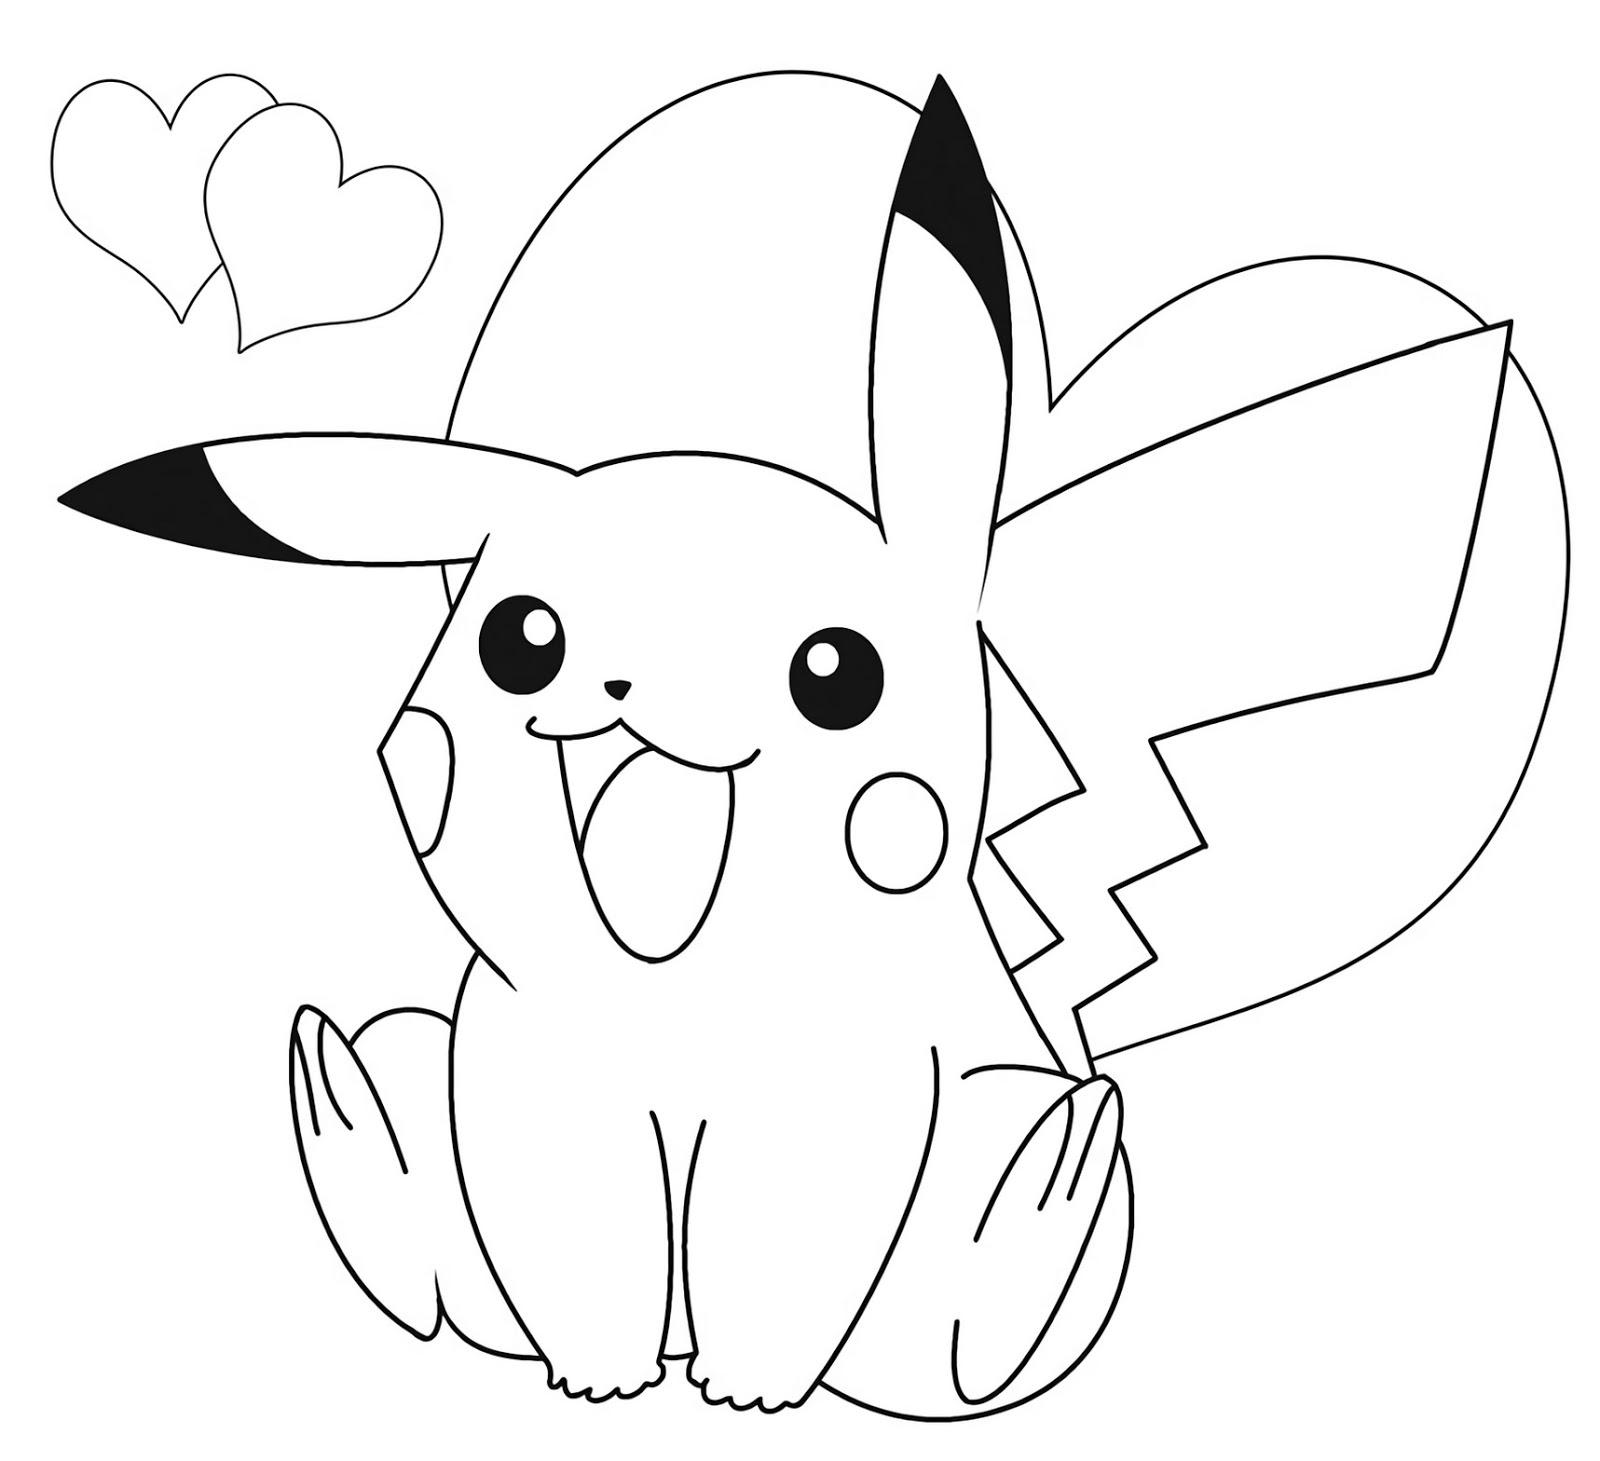 cute love pokemon go pikachu coloring pictures easy to color - pokemon go pictures coloring pages